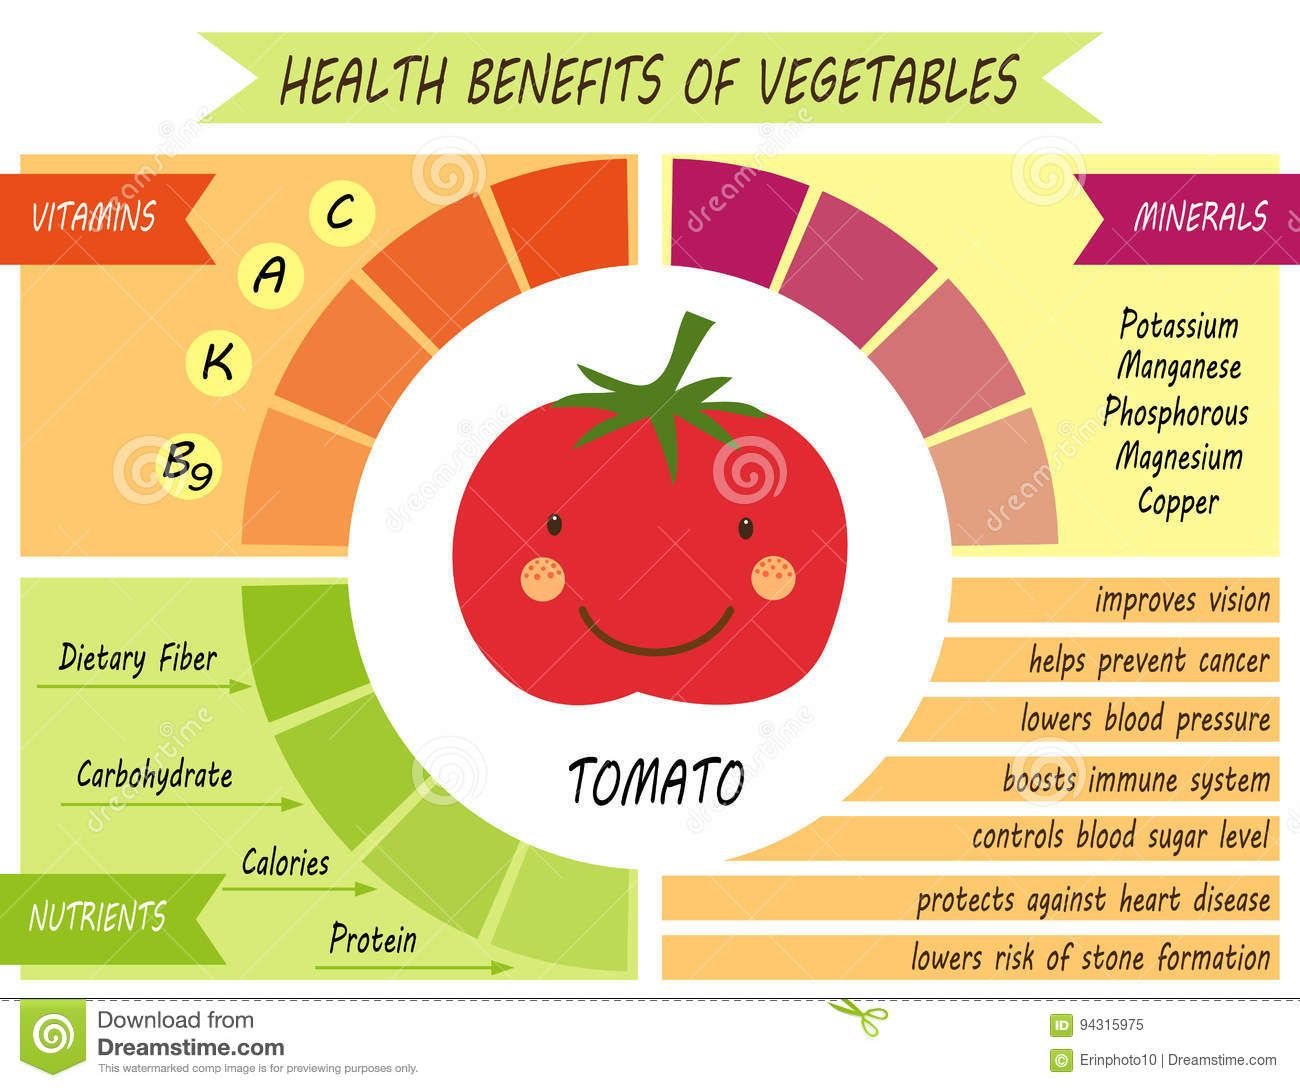 pinlambert johan on resume   vegetable benefits, health